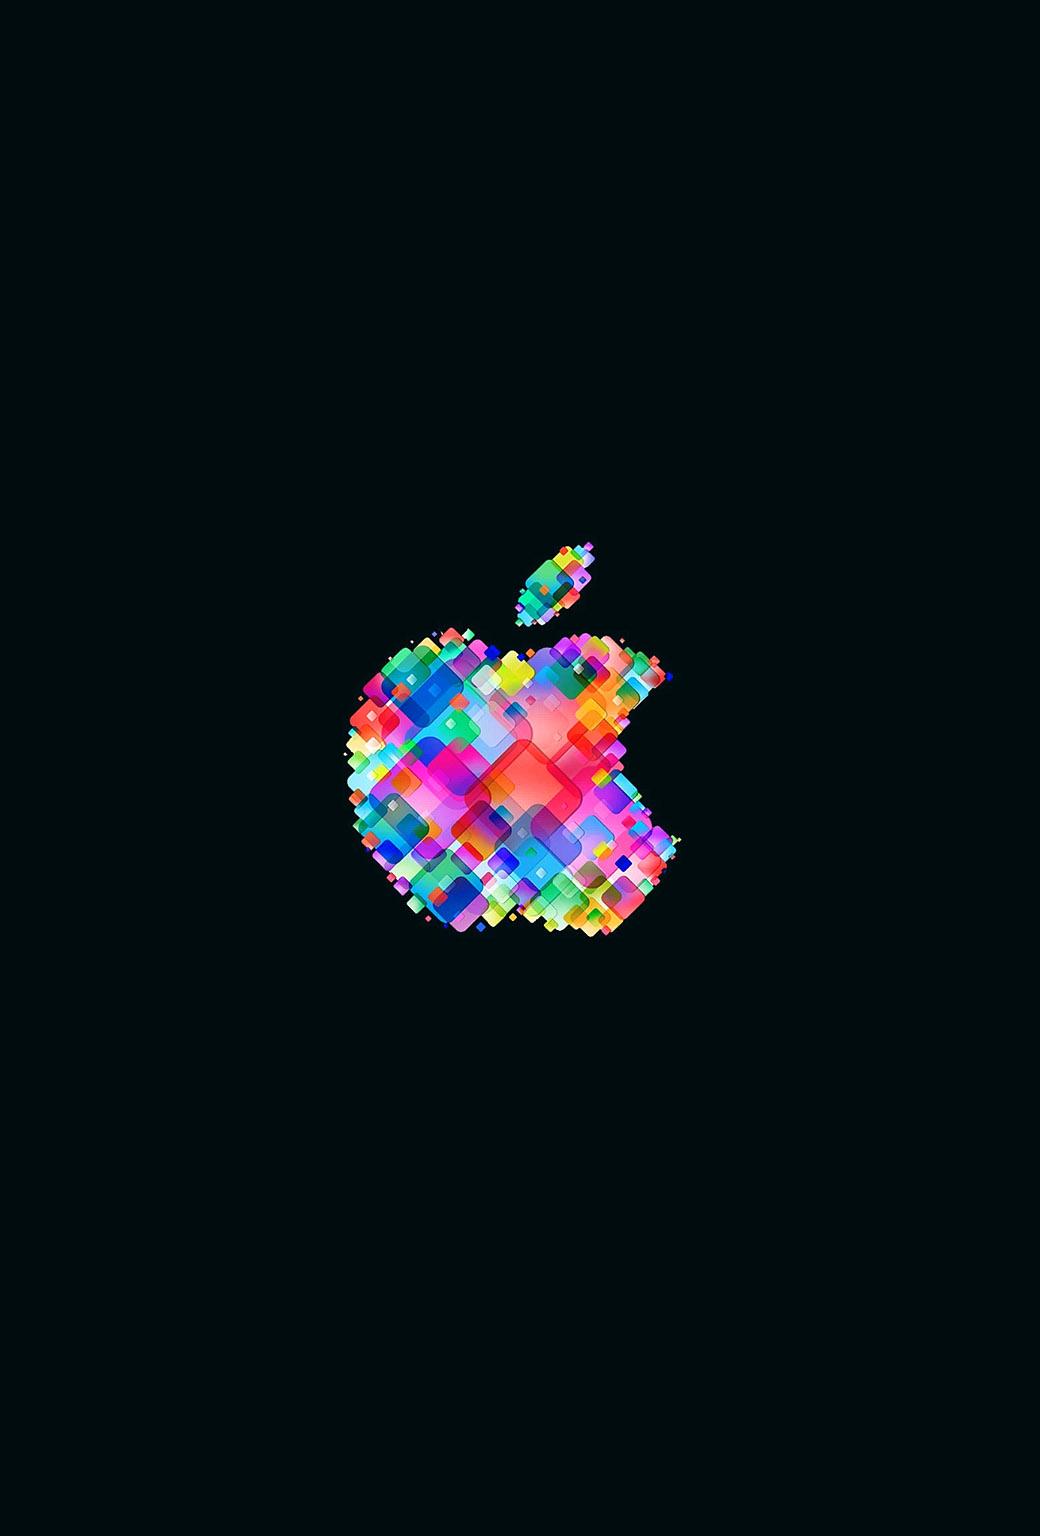 Wallpapers of the week apple logos - Original apple logo wallpaper ...